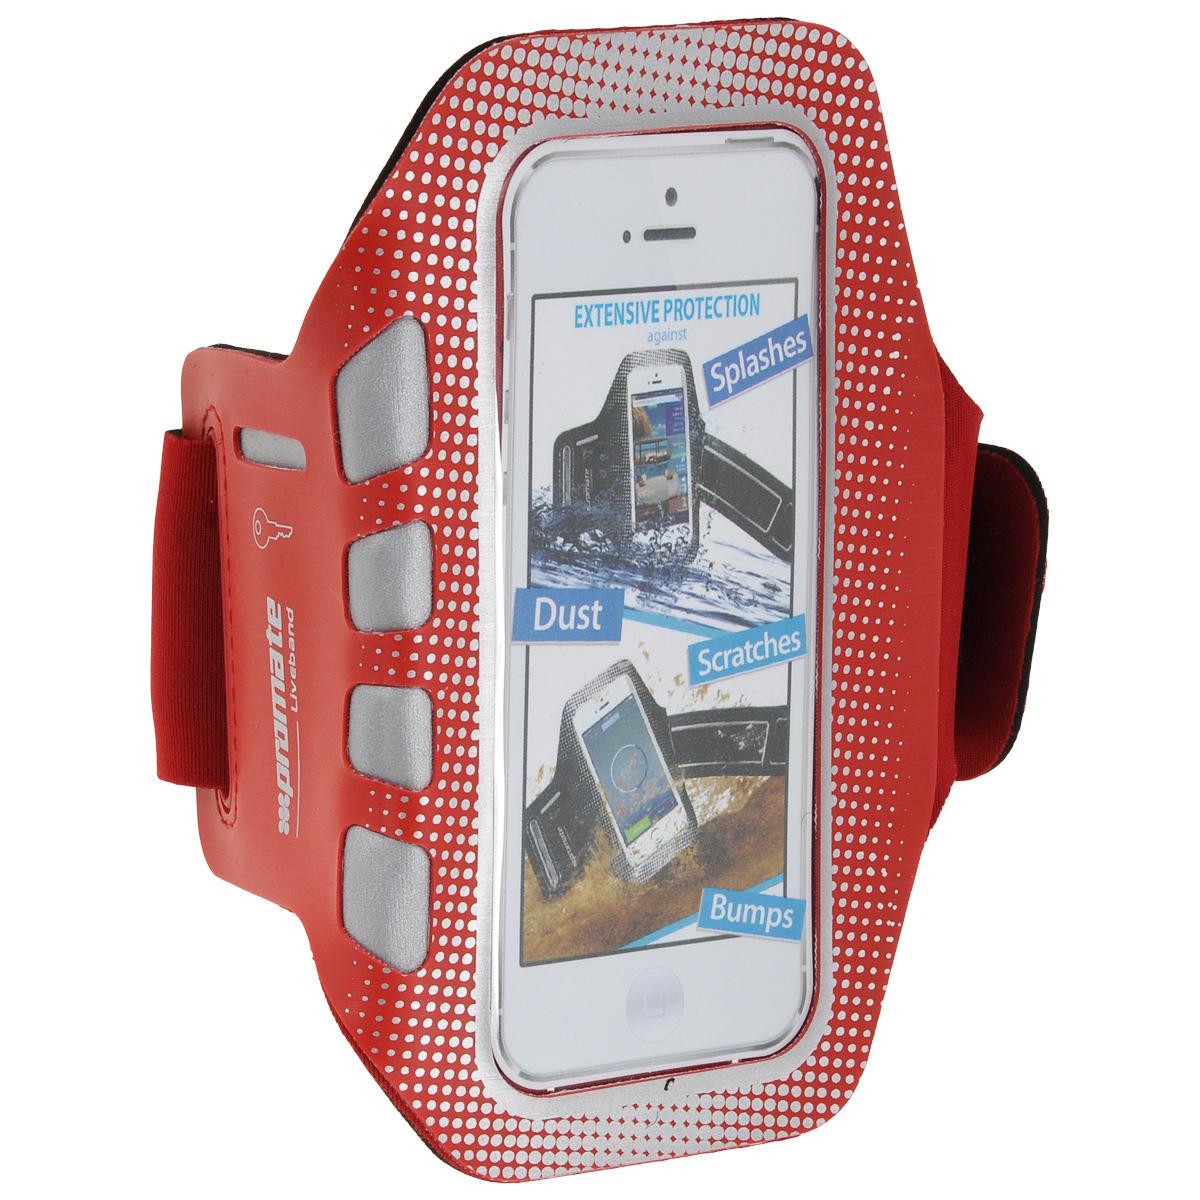 Promate Liveband чехол для iPhone 5/5s, Red